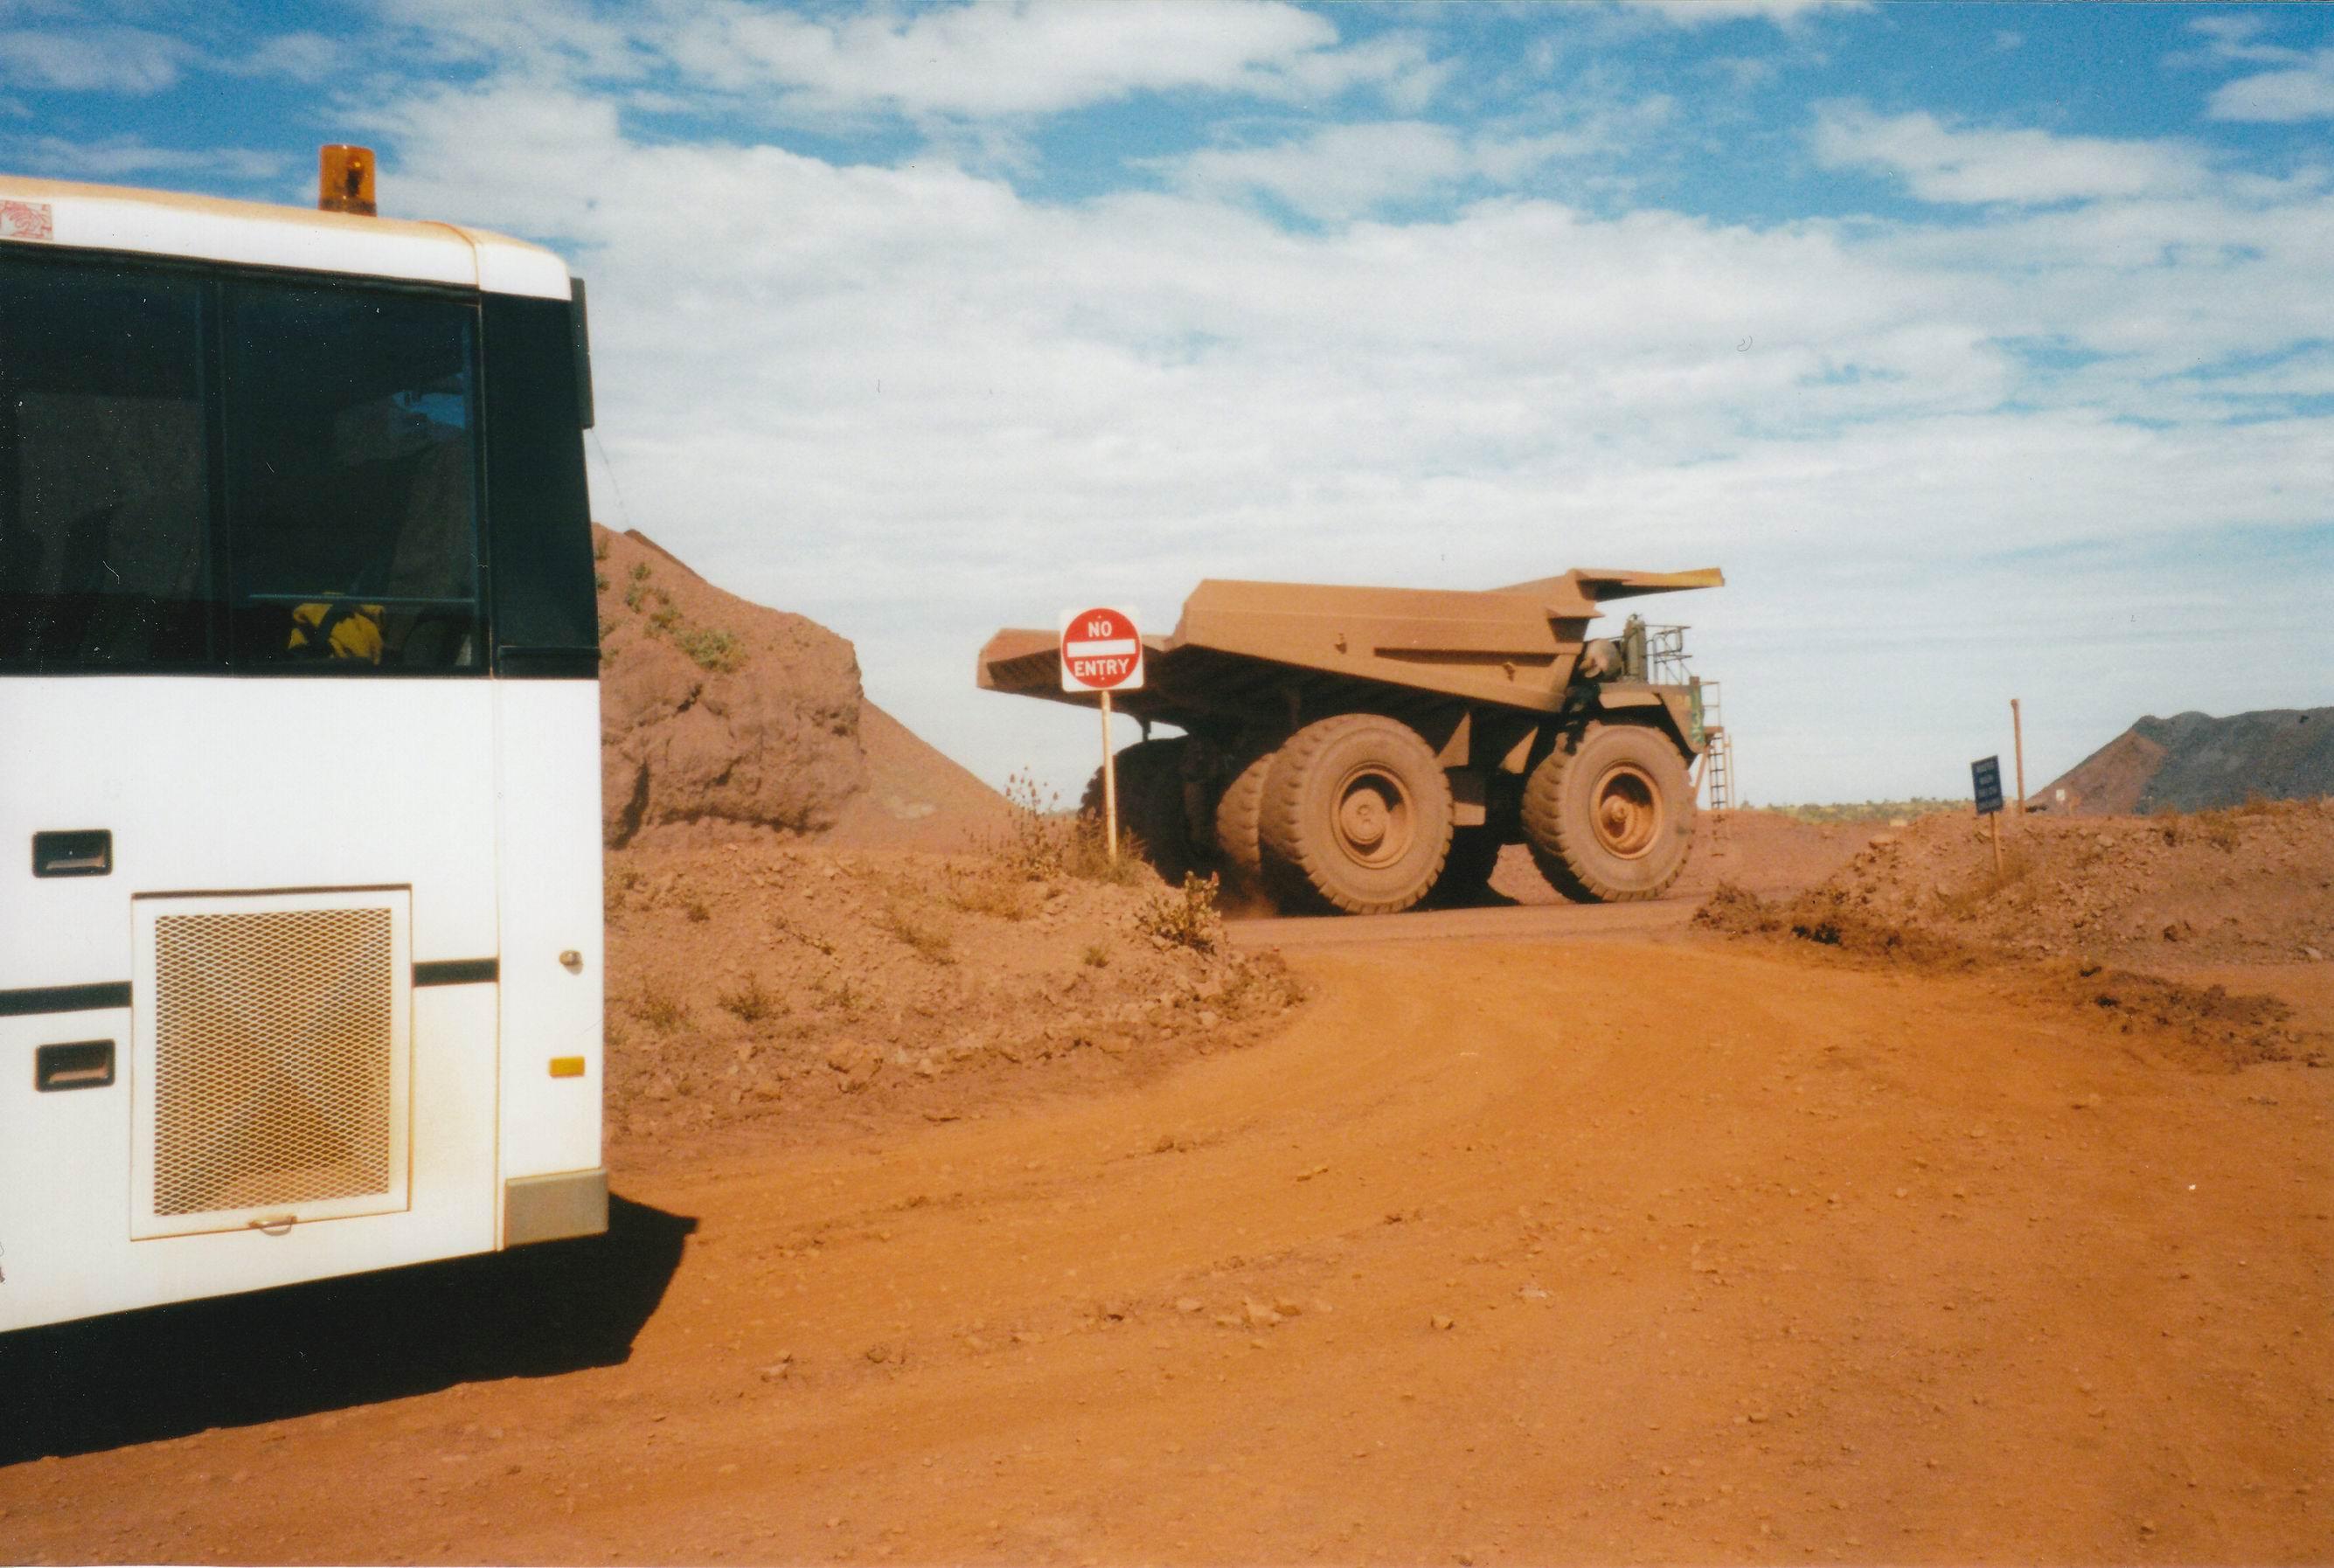 Resize of 07-23-2004 01 Newman mine haul truck.jpg